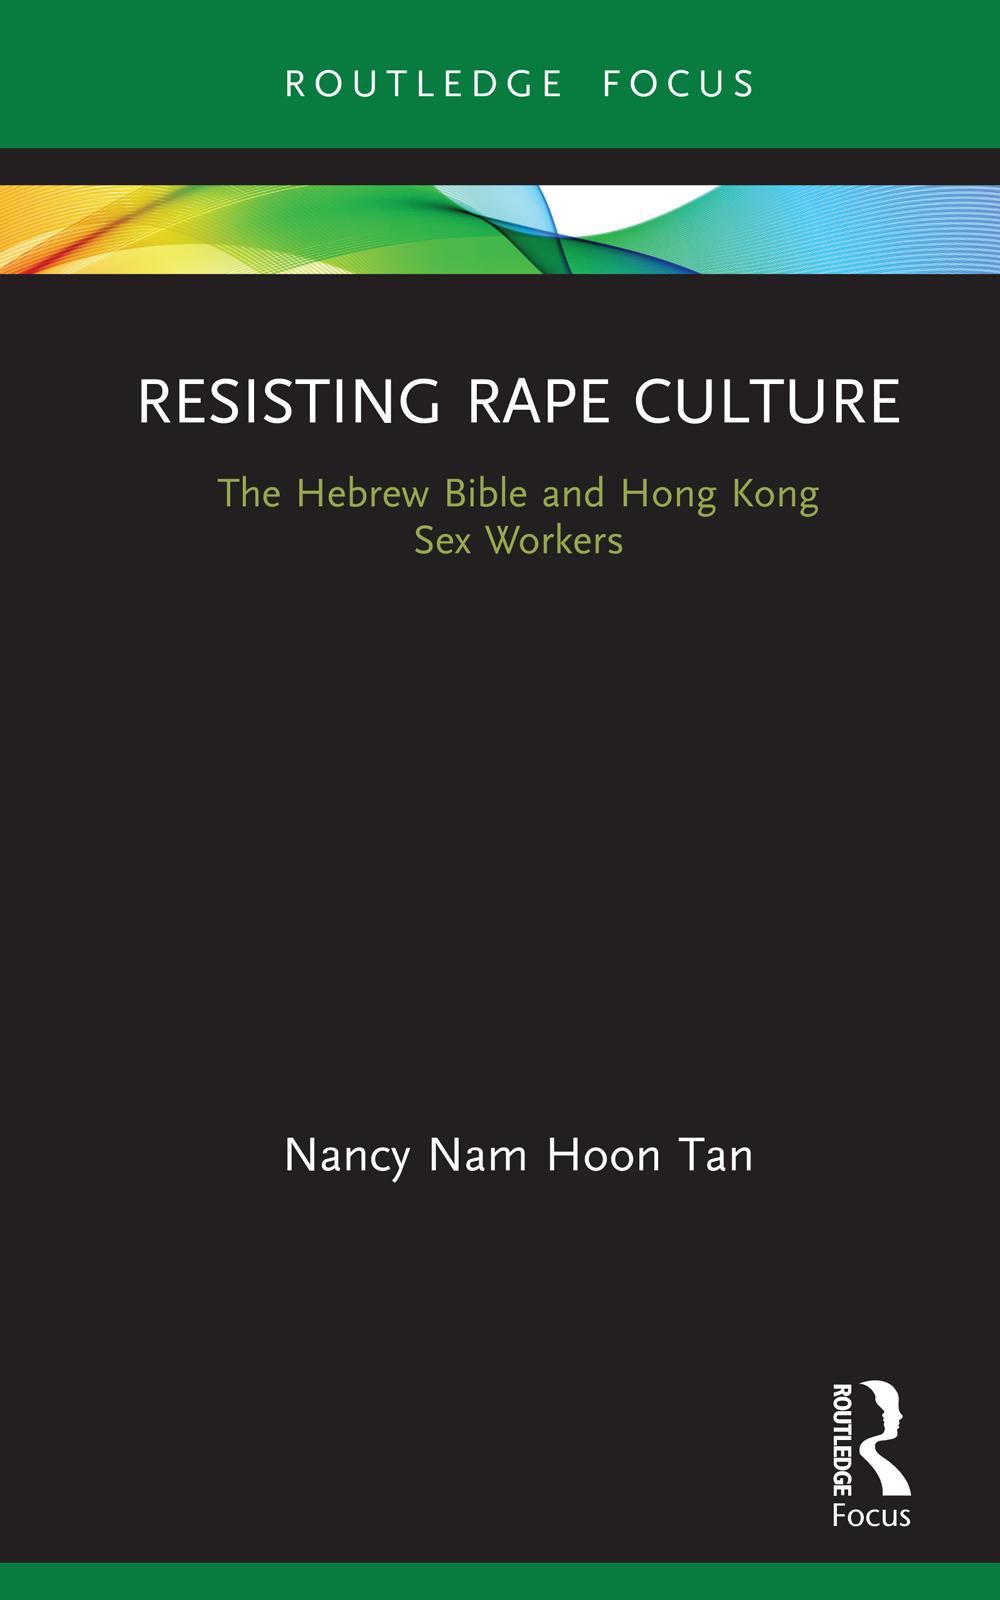 Resisting Rape Culture